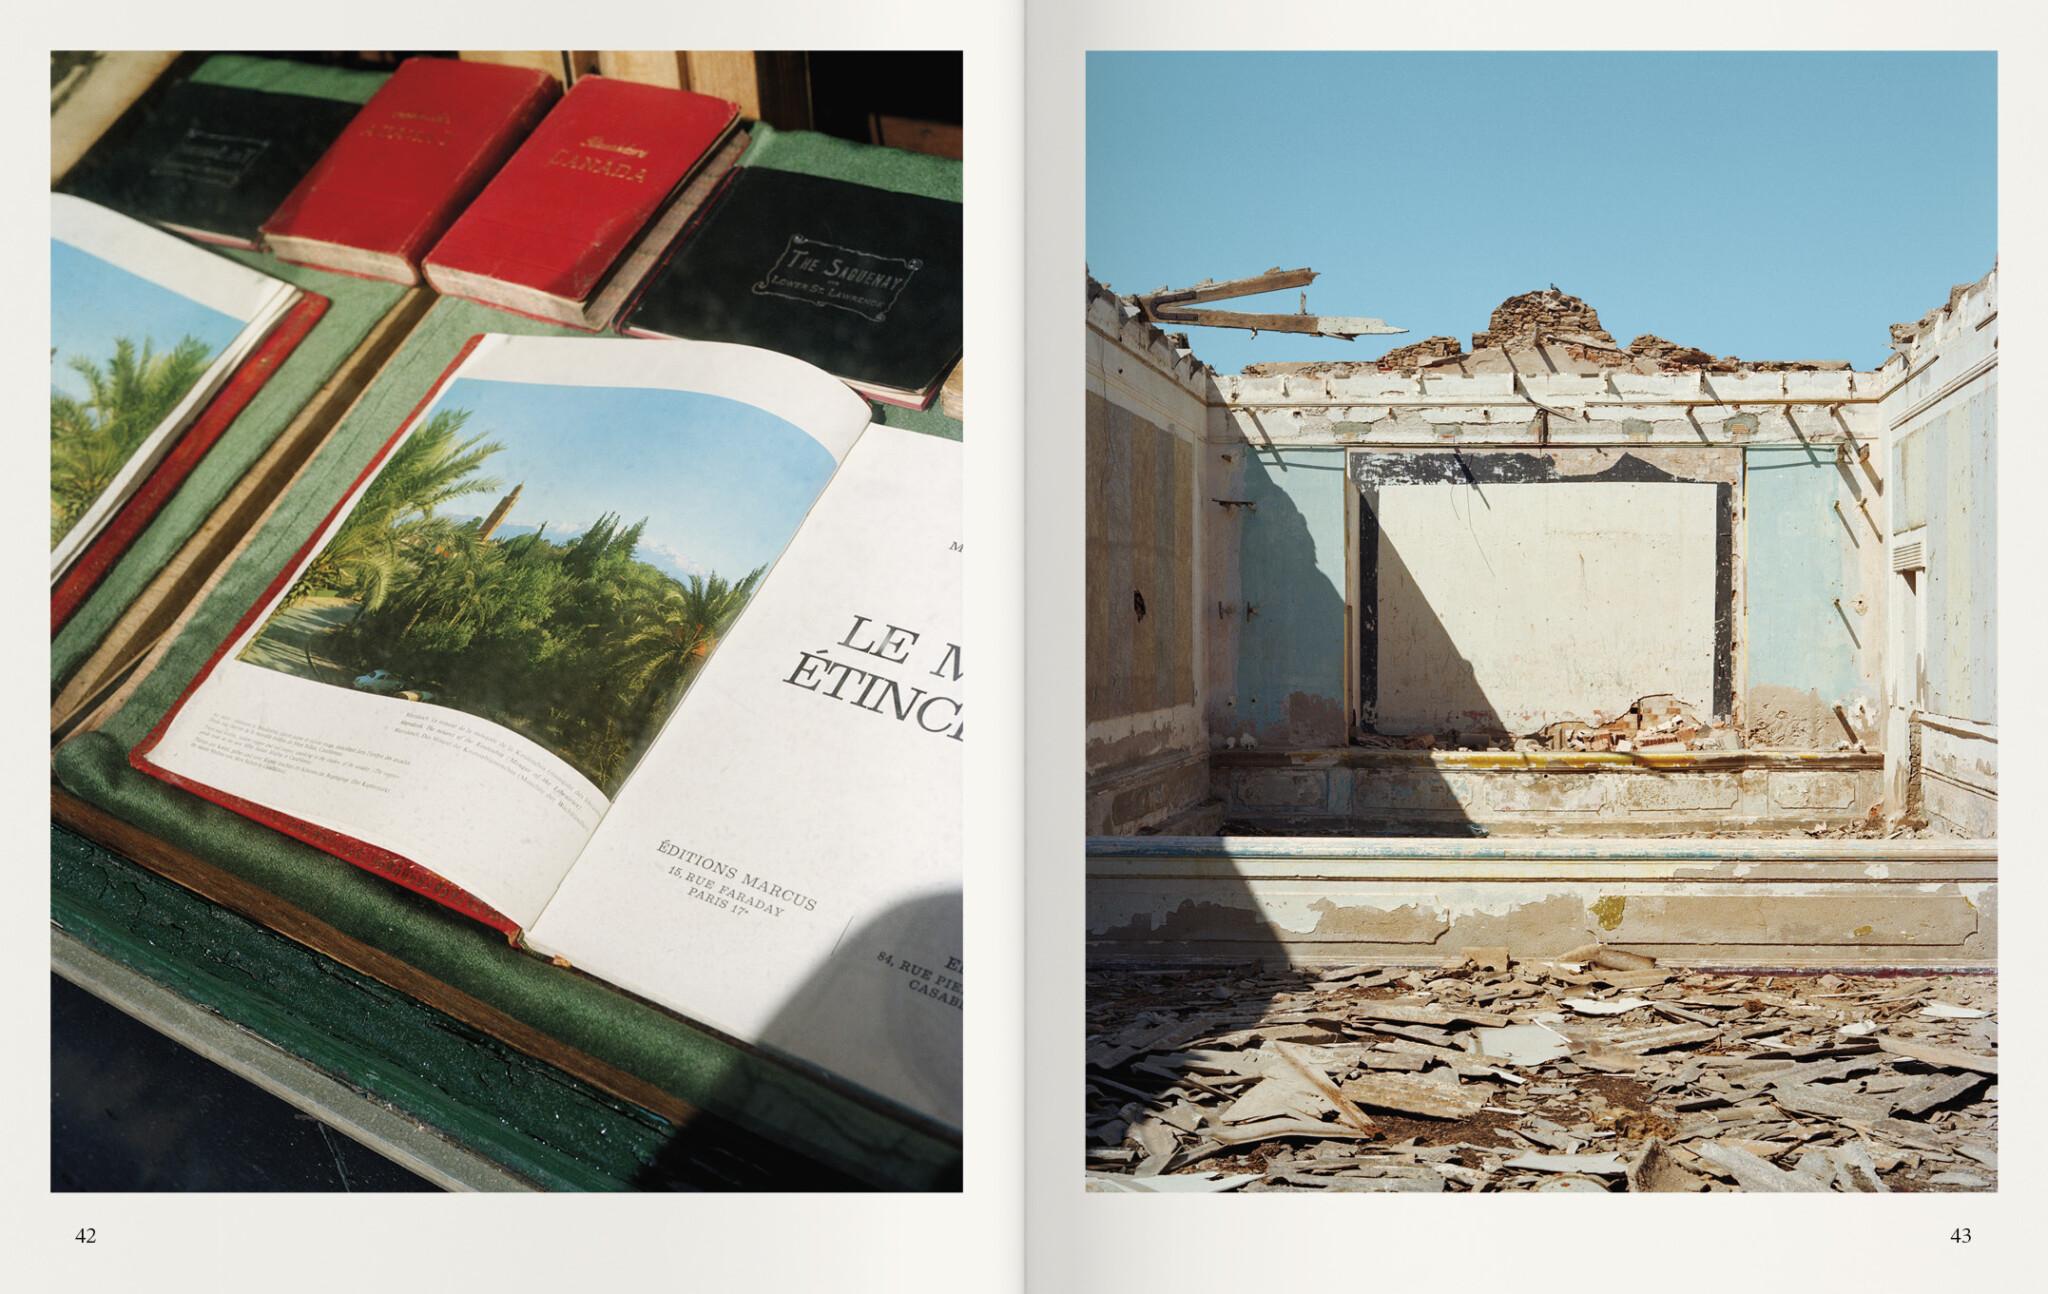 photoq-bookshop-ediciones-anomalas-federico-clavarino-ghost-stories-7